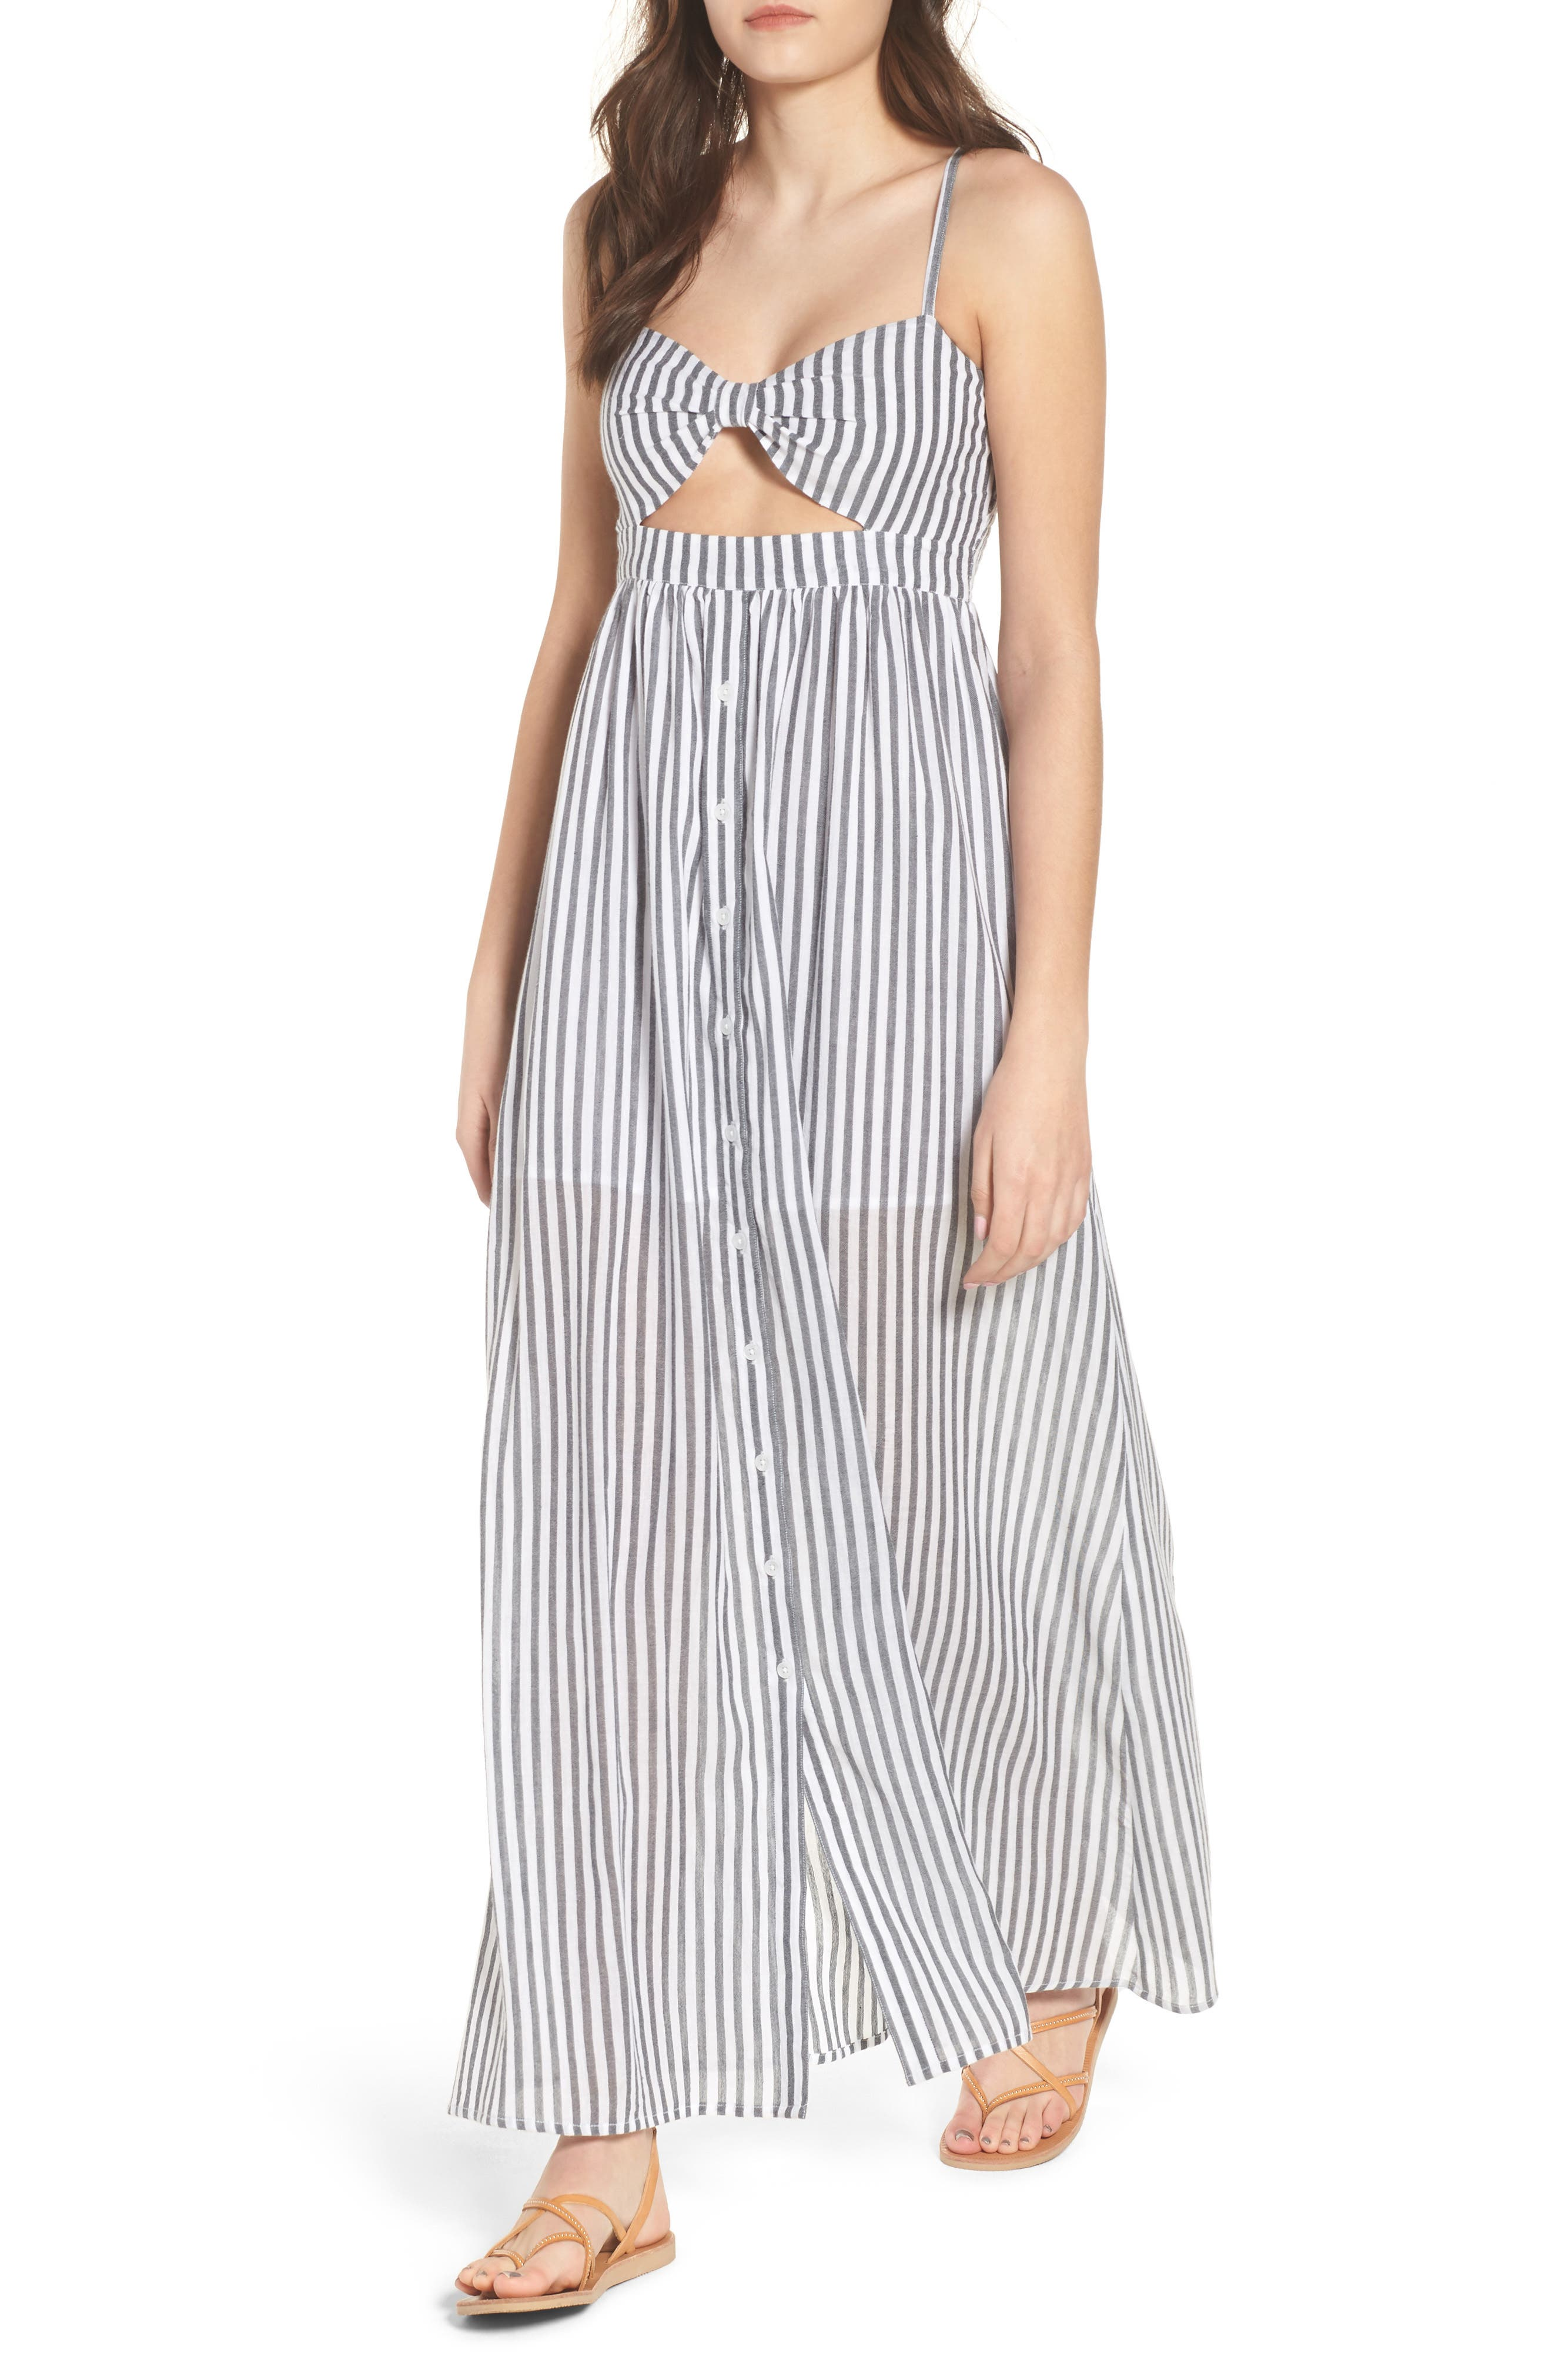 Stripe Button Front Maxi Dress,                             Main thumbnail 1, color,                             White City Stripe